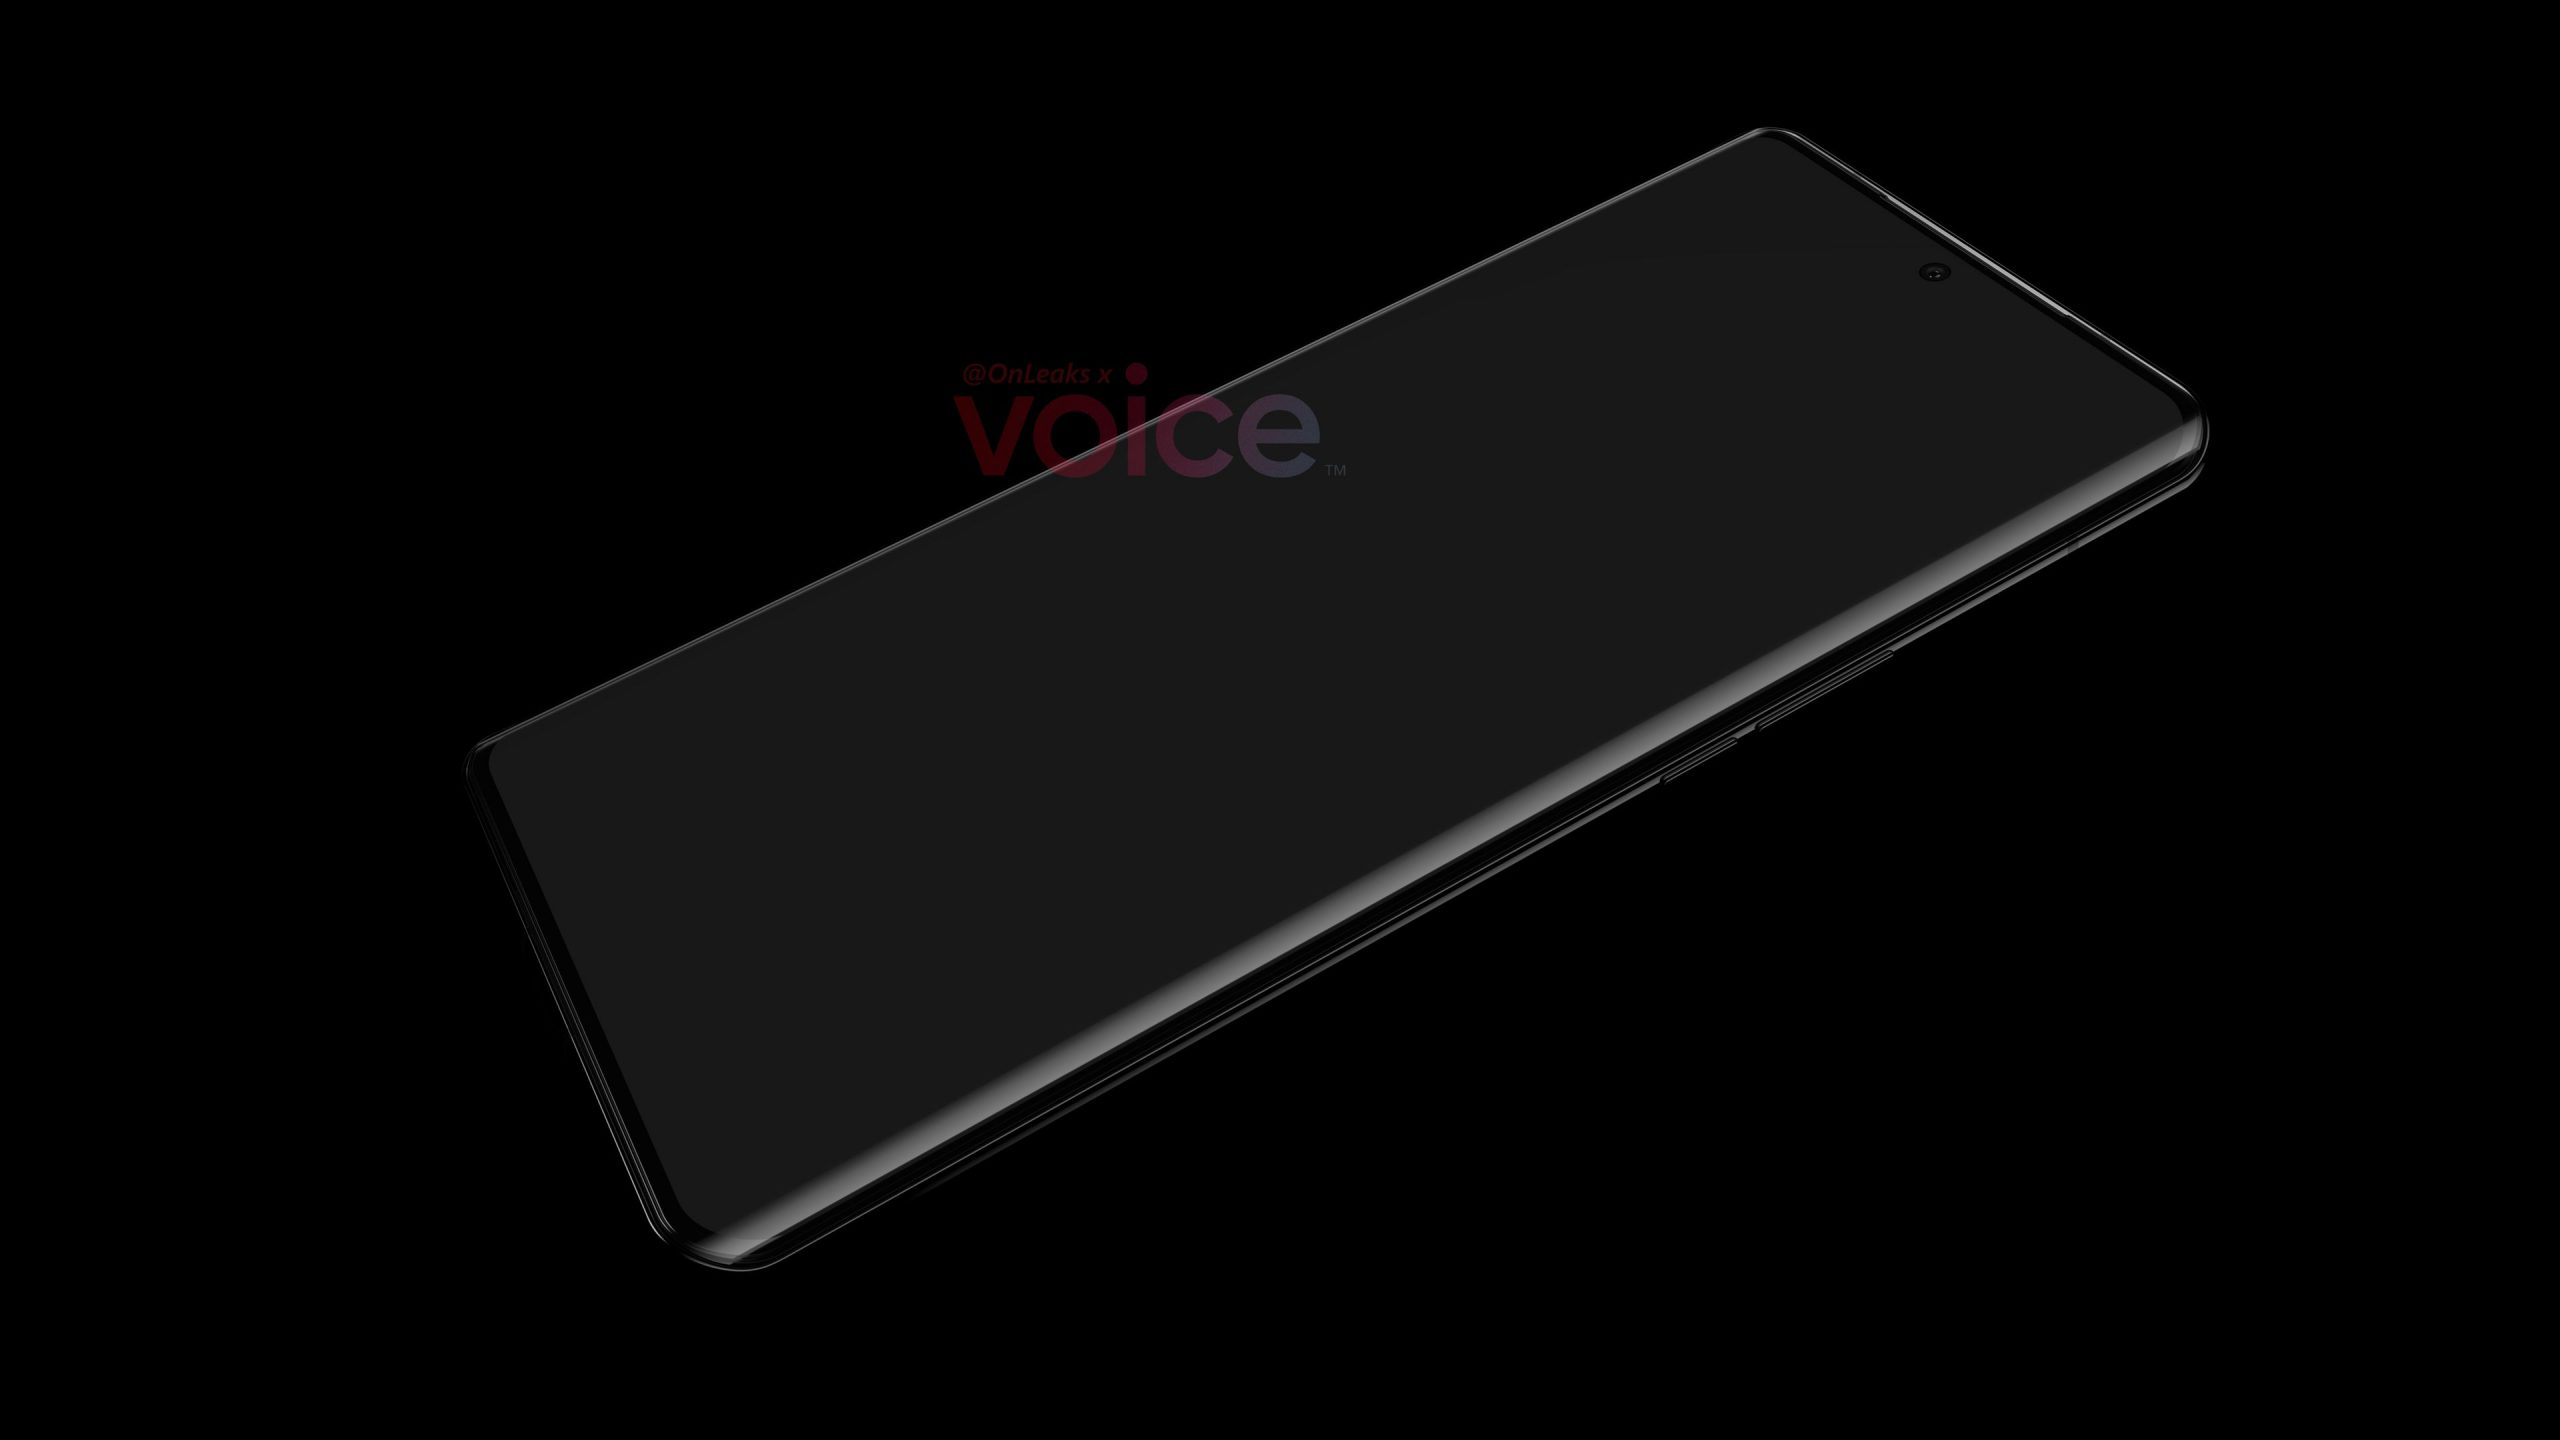 Voice Huawei P50 Pro